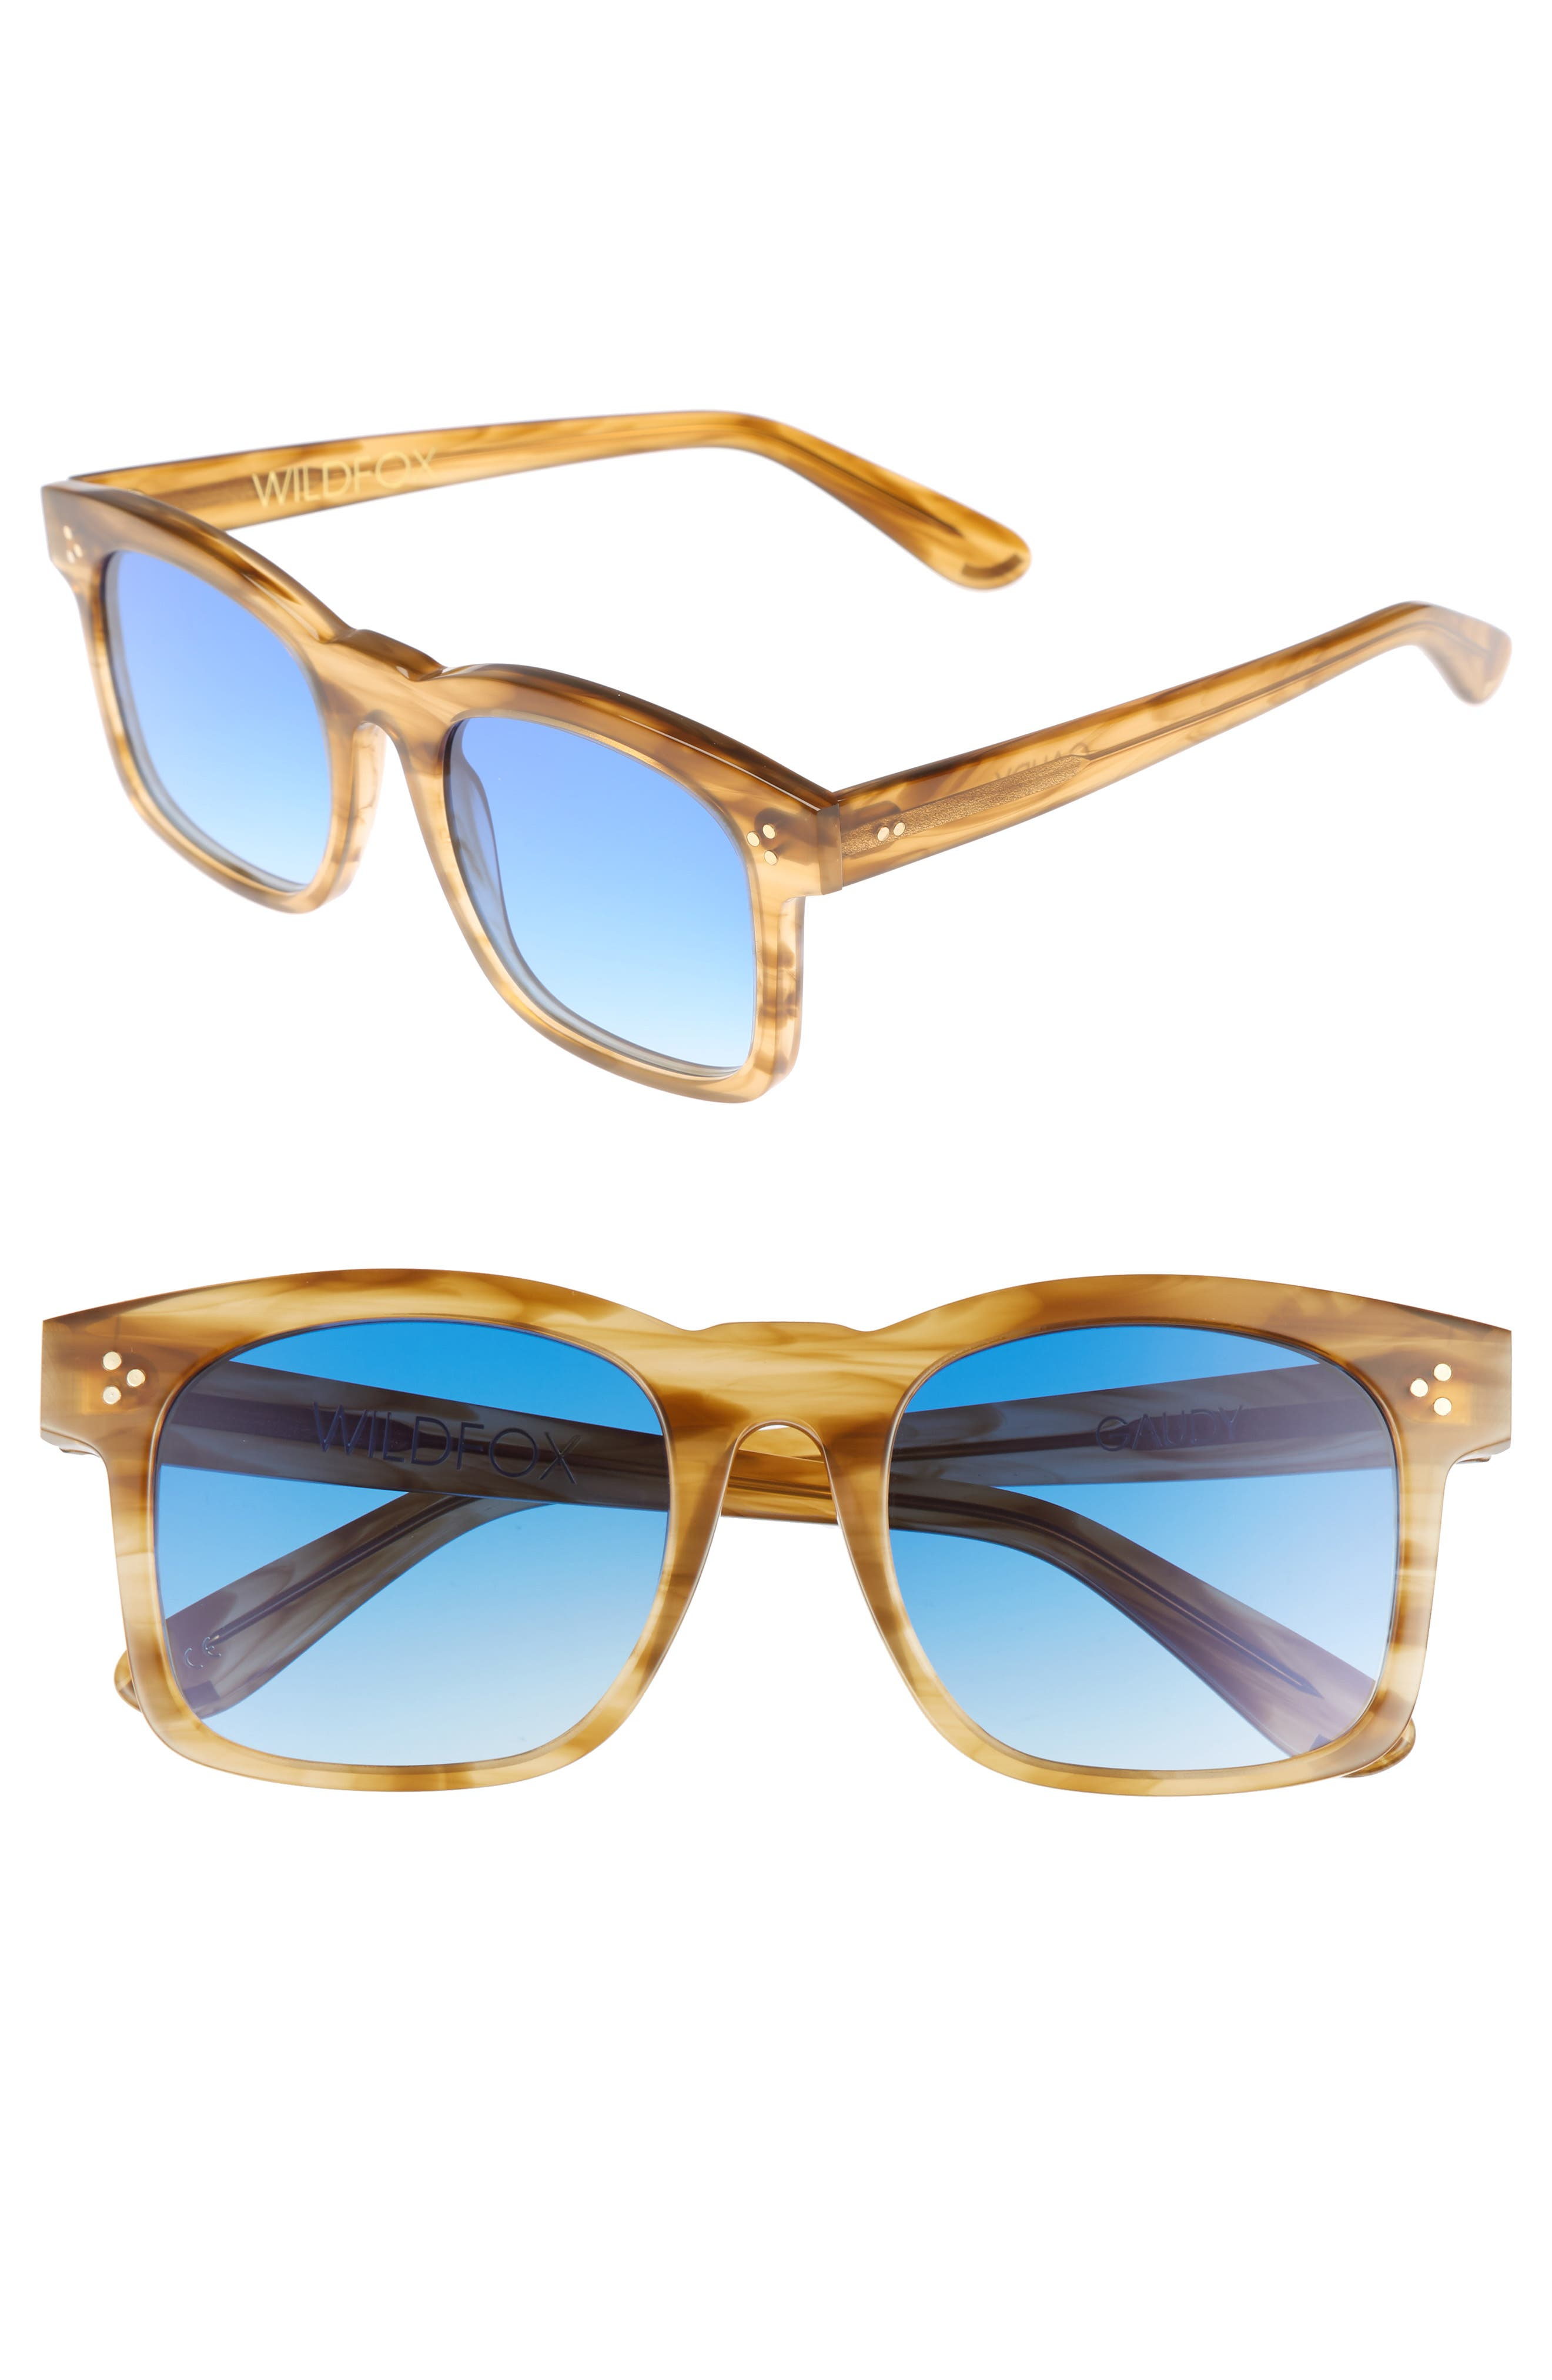 Gaudy Zero 51Mm Flat Square Sunglasses - Sierra Tortoise